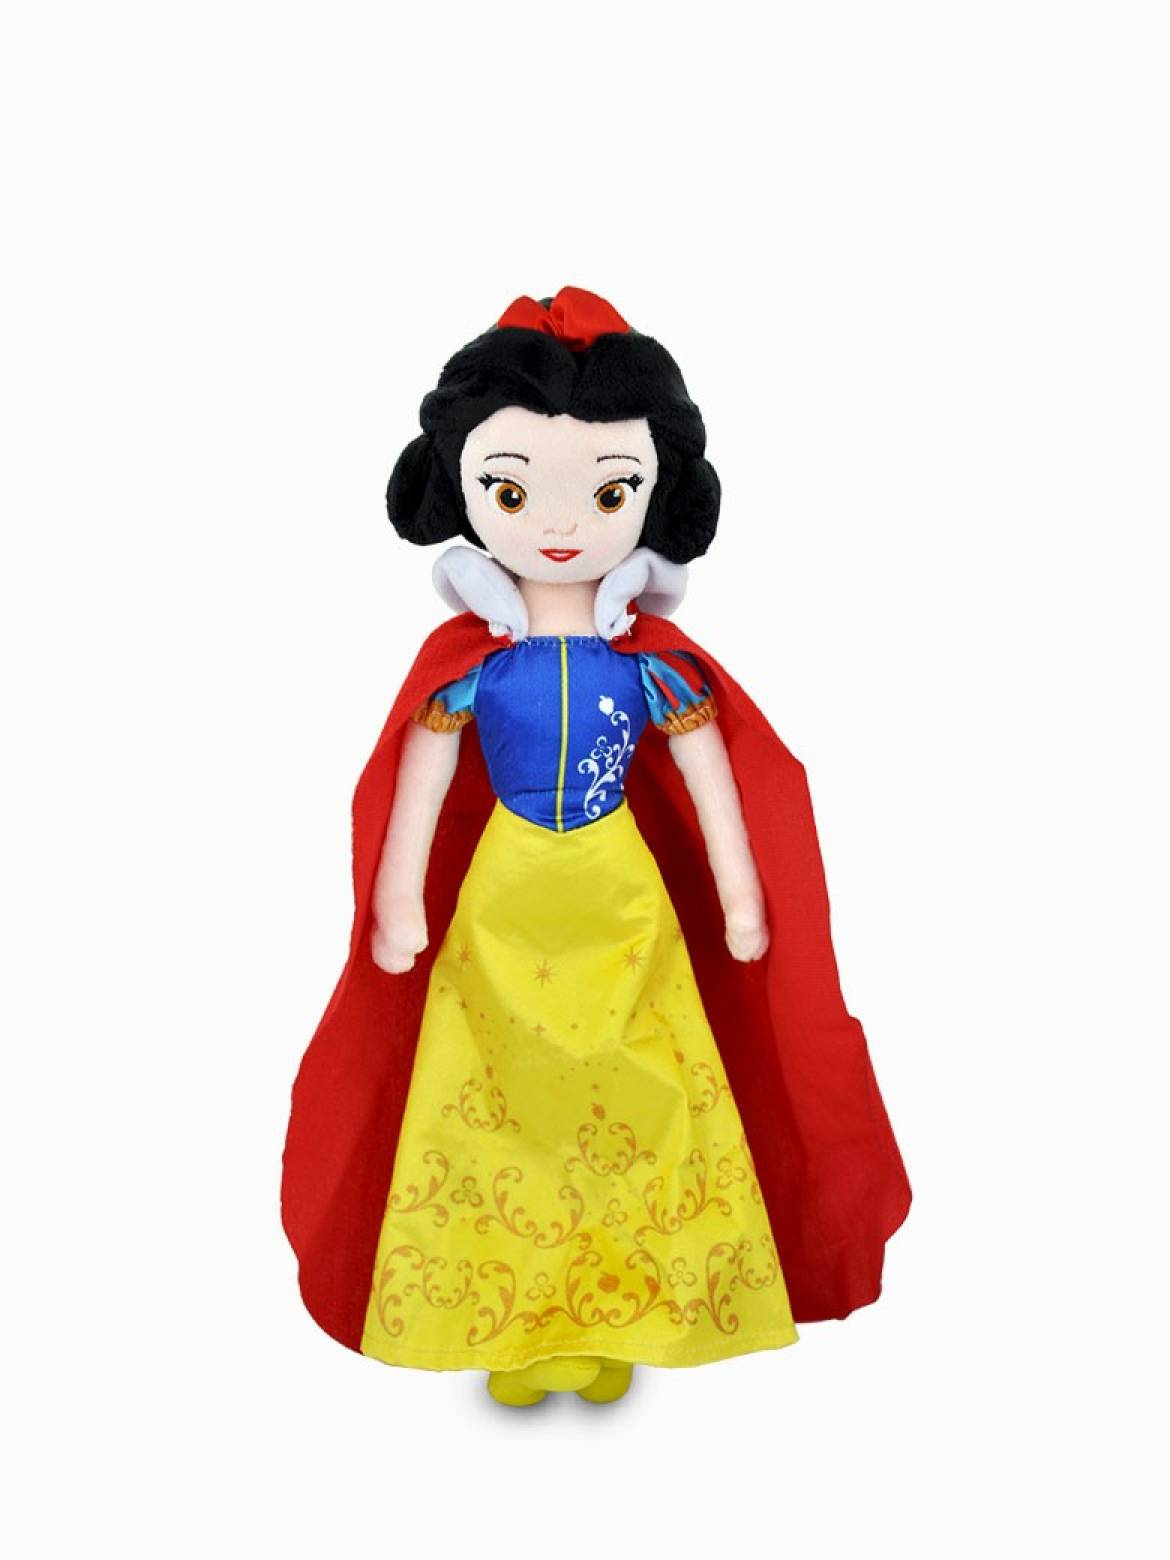 Disney Plush Princess Snow White 16 inch Mainan Boneka Original